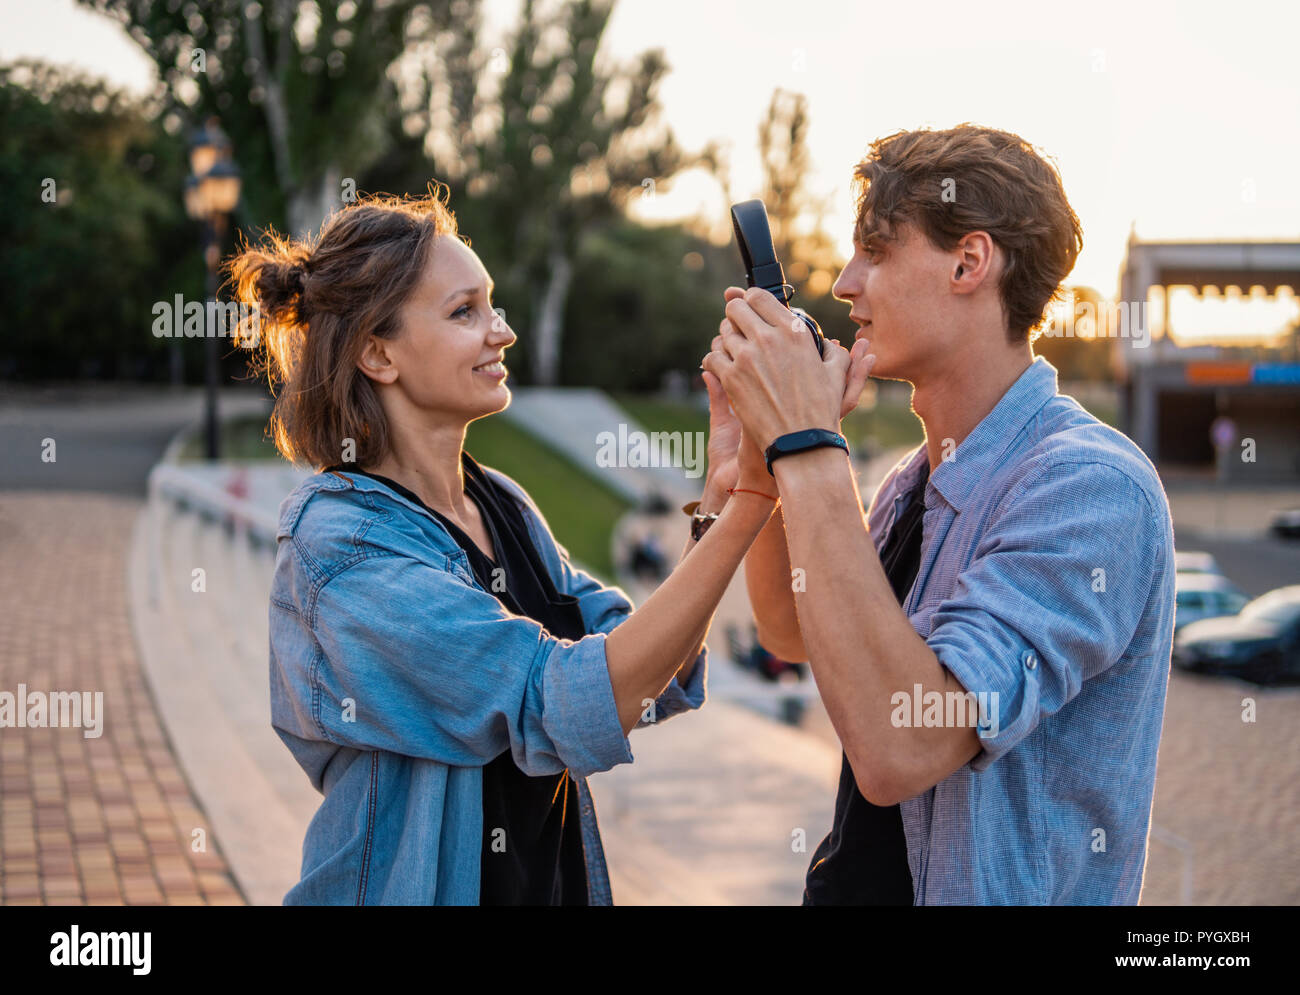 TISHA: Hi five dating site